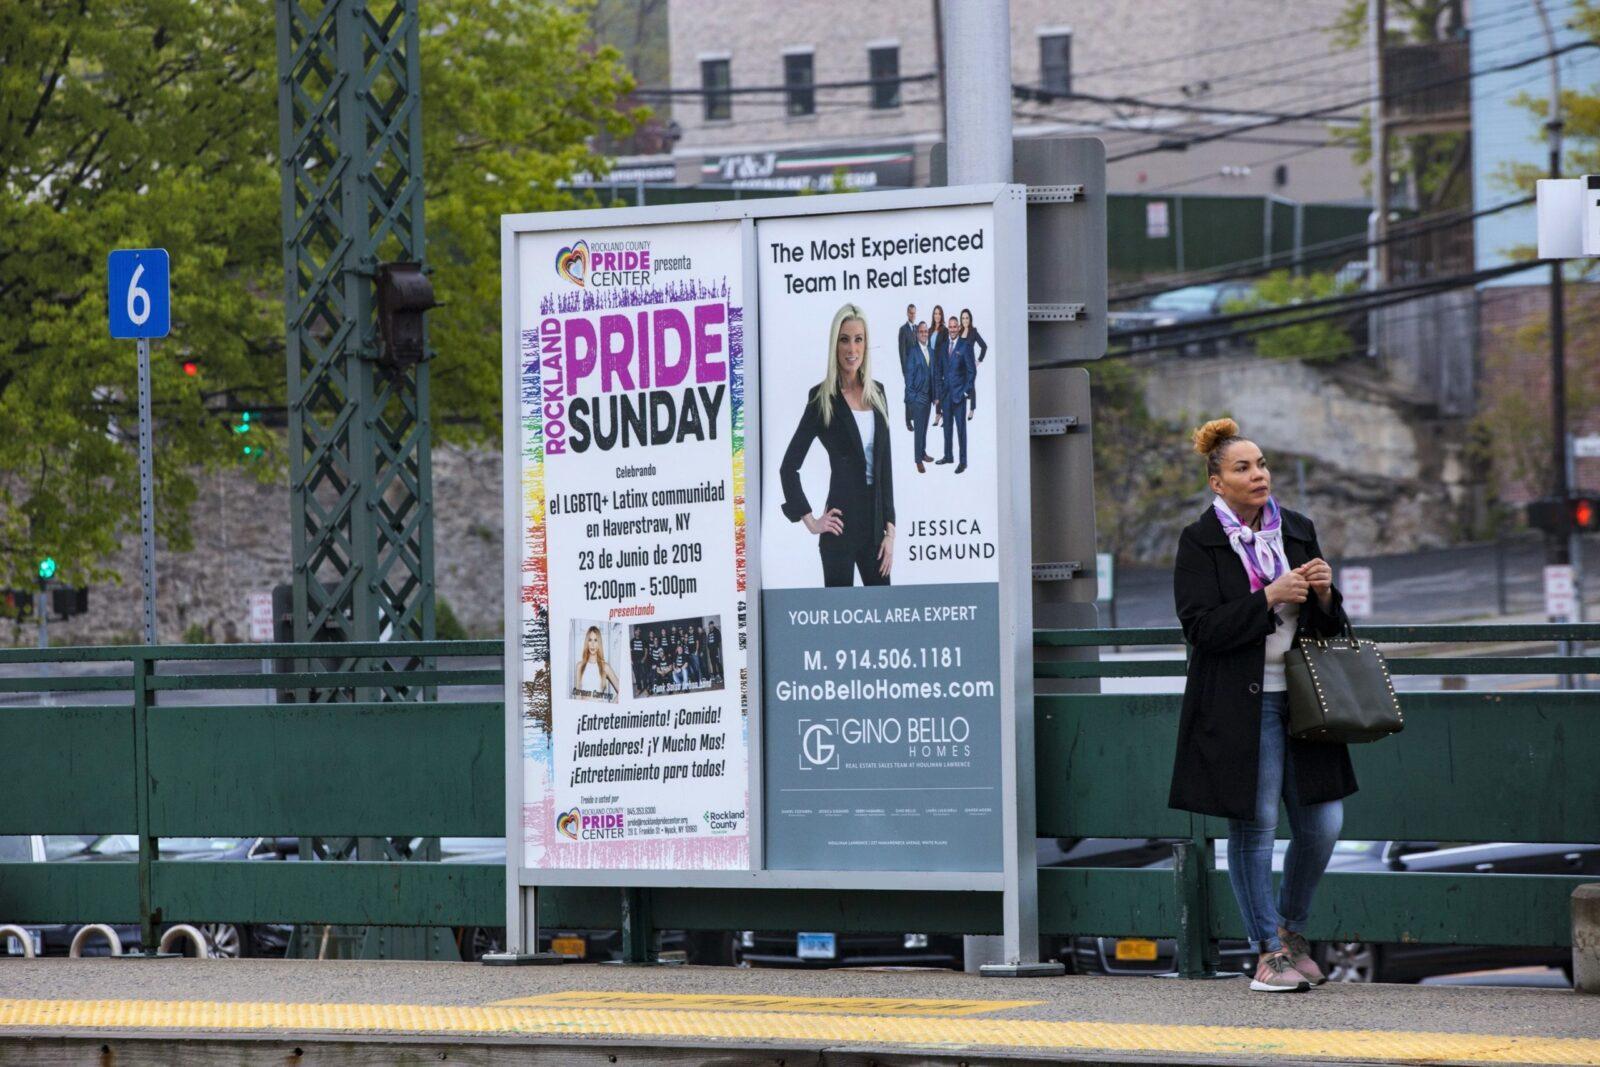 Rocklaand Pride Center Rail Platform Advertising